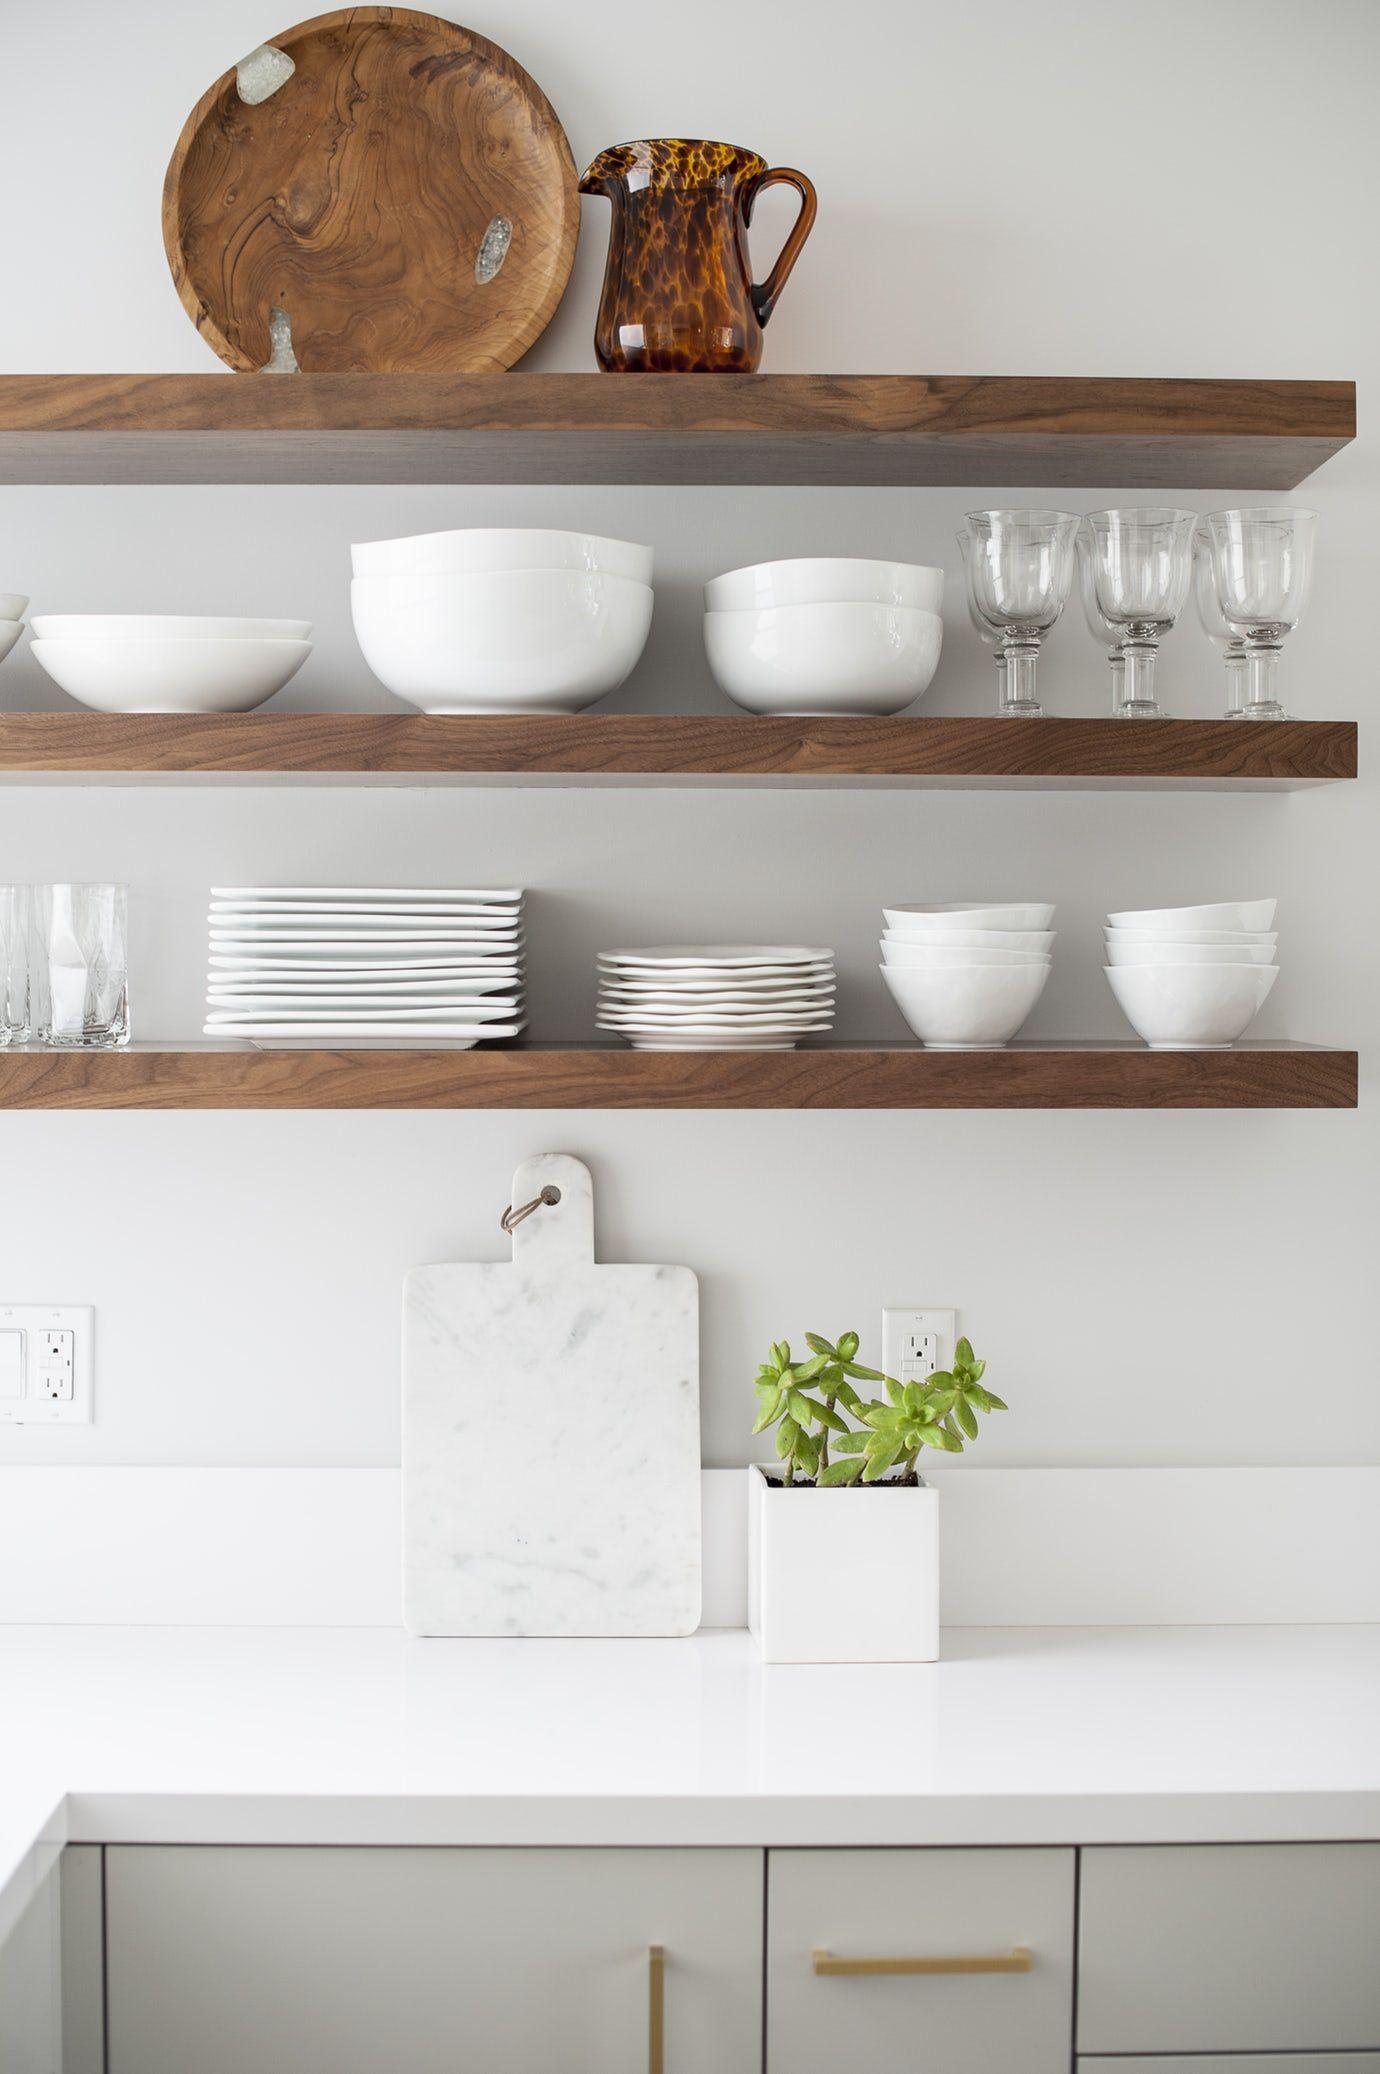 modern farmhouse kitchen with open shelving quartz countertop gold accents kitchen on farmhouse kitchen open shelves id=54504